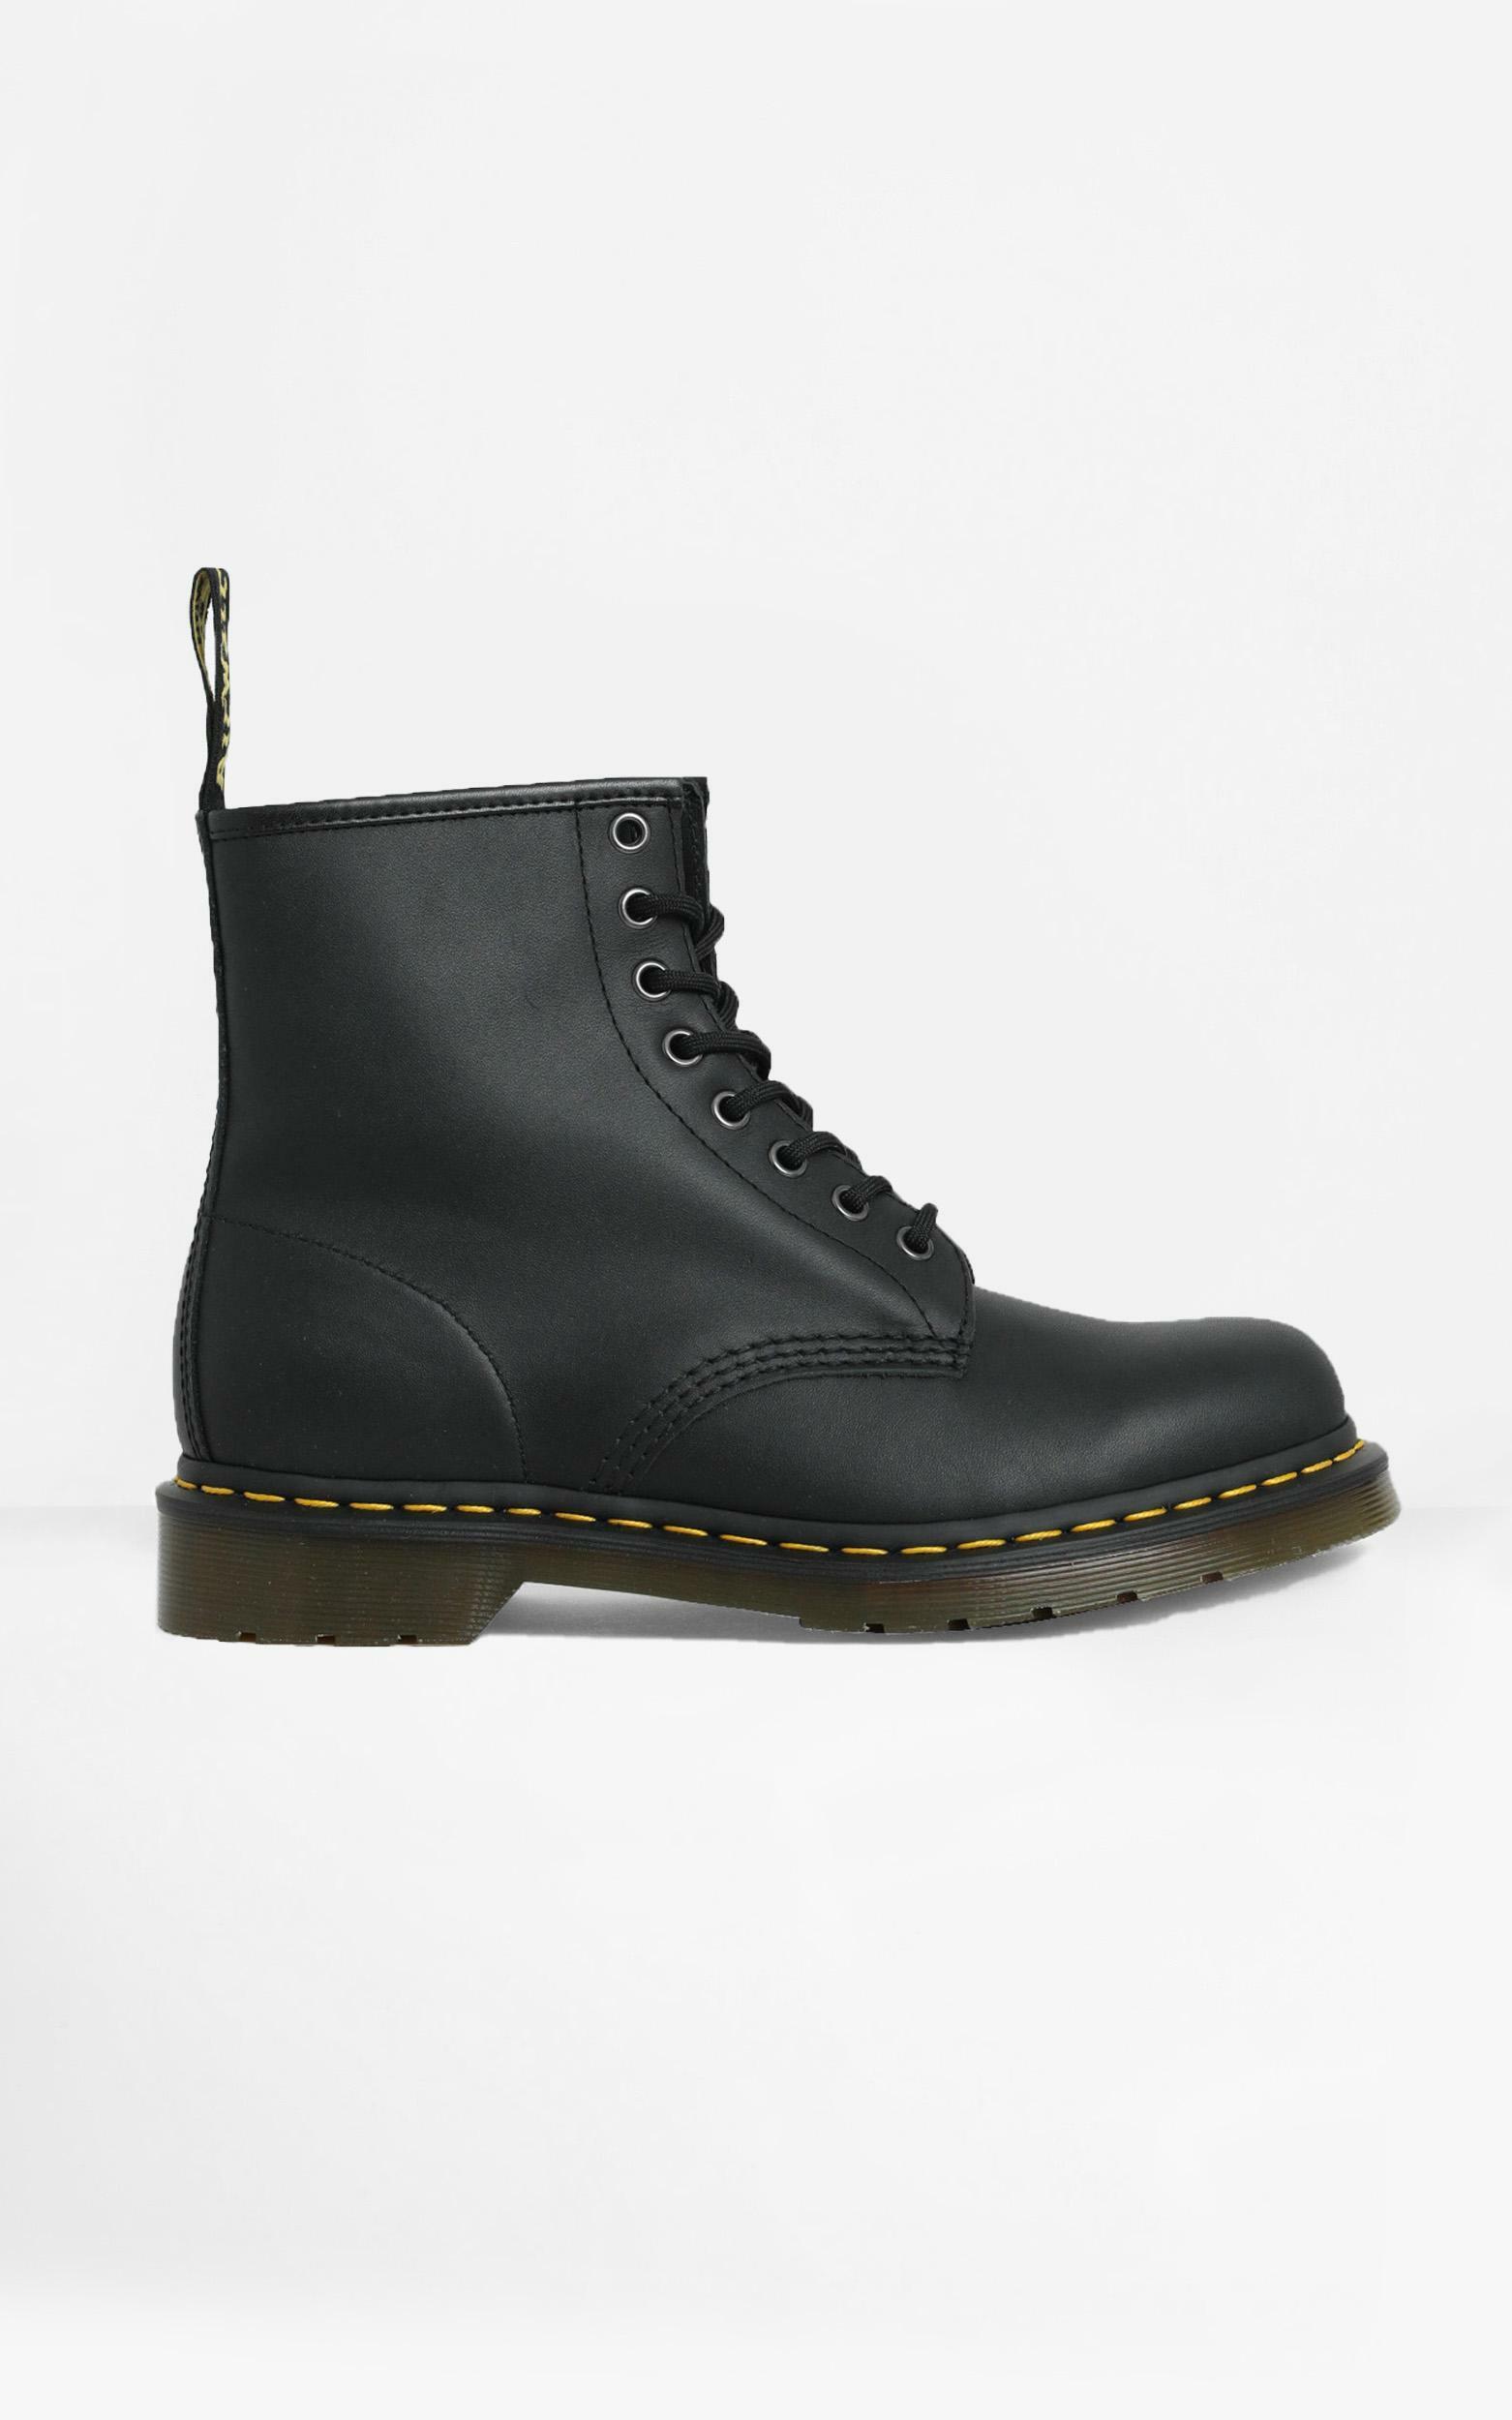 Dr. Martens - 1460 Nappa 8 Eye Boot in Black Nappa - 5, Black, hi-res image number null